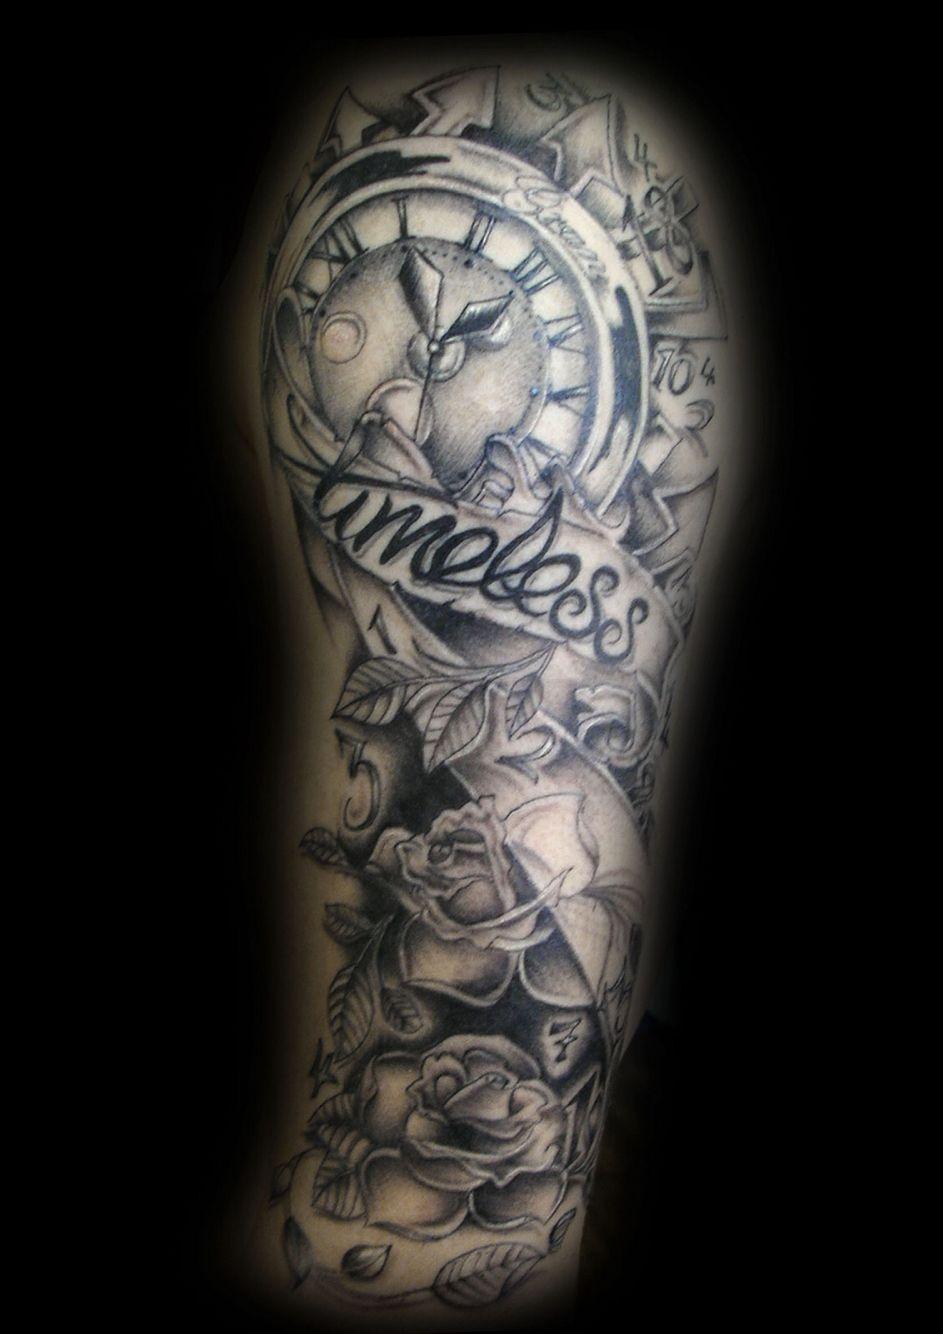 Timeless Sleeve Clock Tattoo Timeless Tattoo Vintage Clock Tattoos